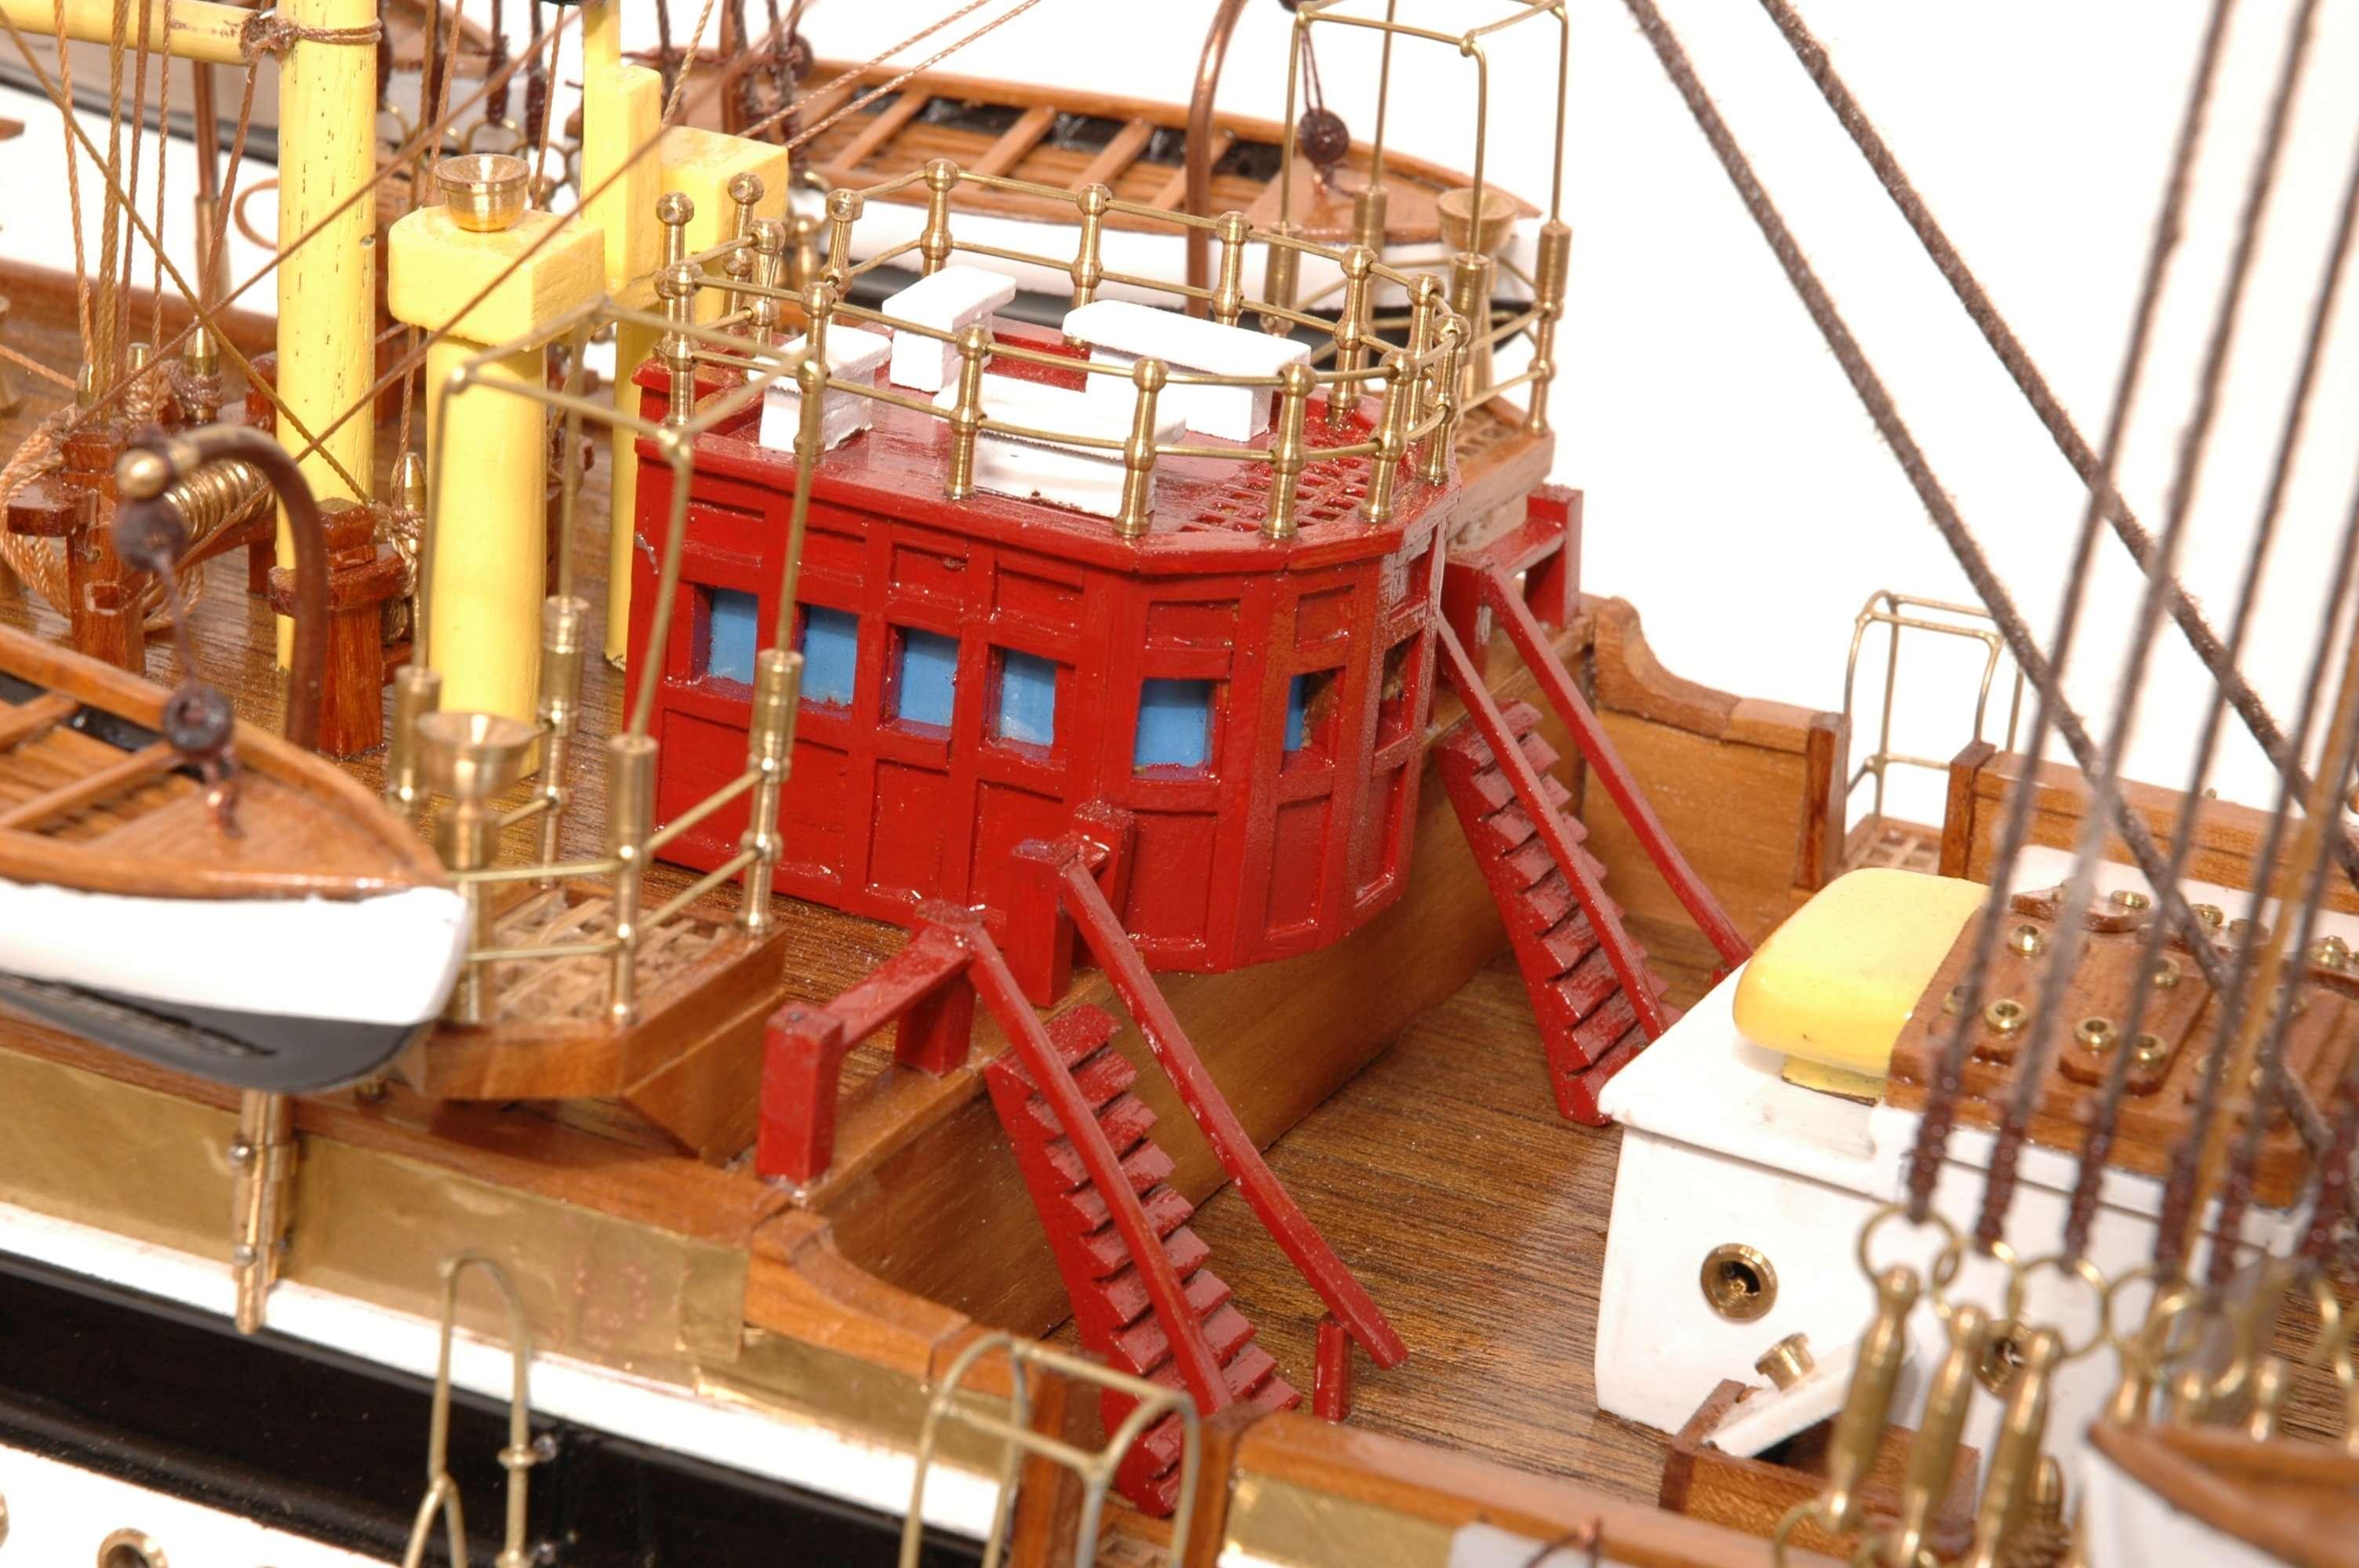 498-4216-Amerigo-Vespucci-Model-Ship-Superior-Range